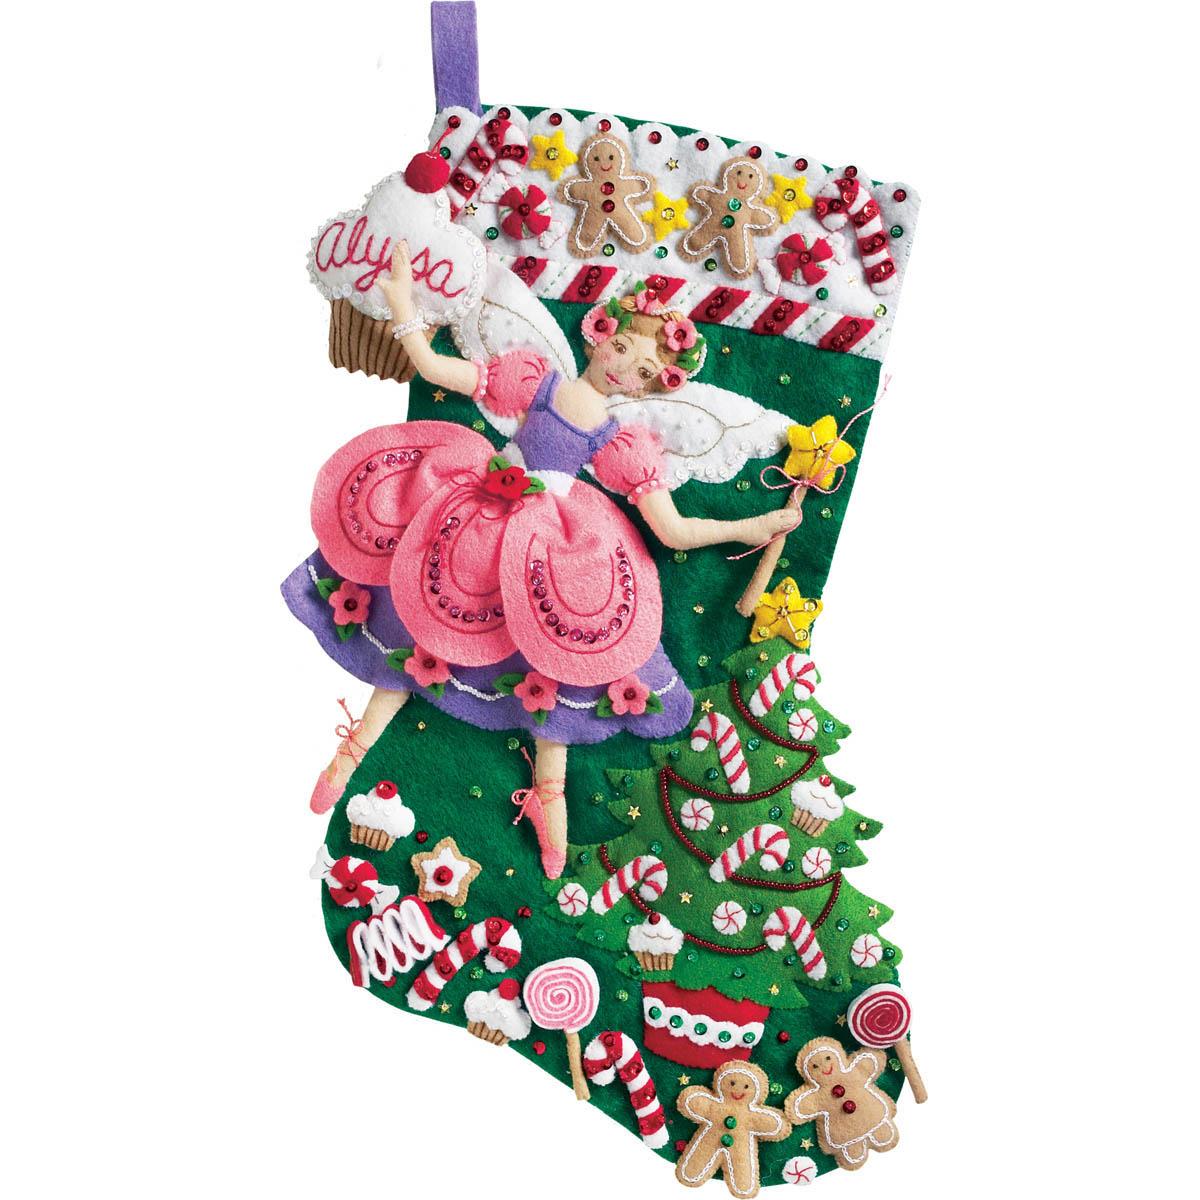 Bucilla ® Seasonal - Felt - Stocking Kits - Christmas Sugar Plum Fairy